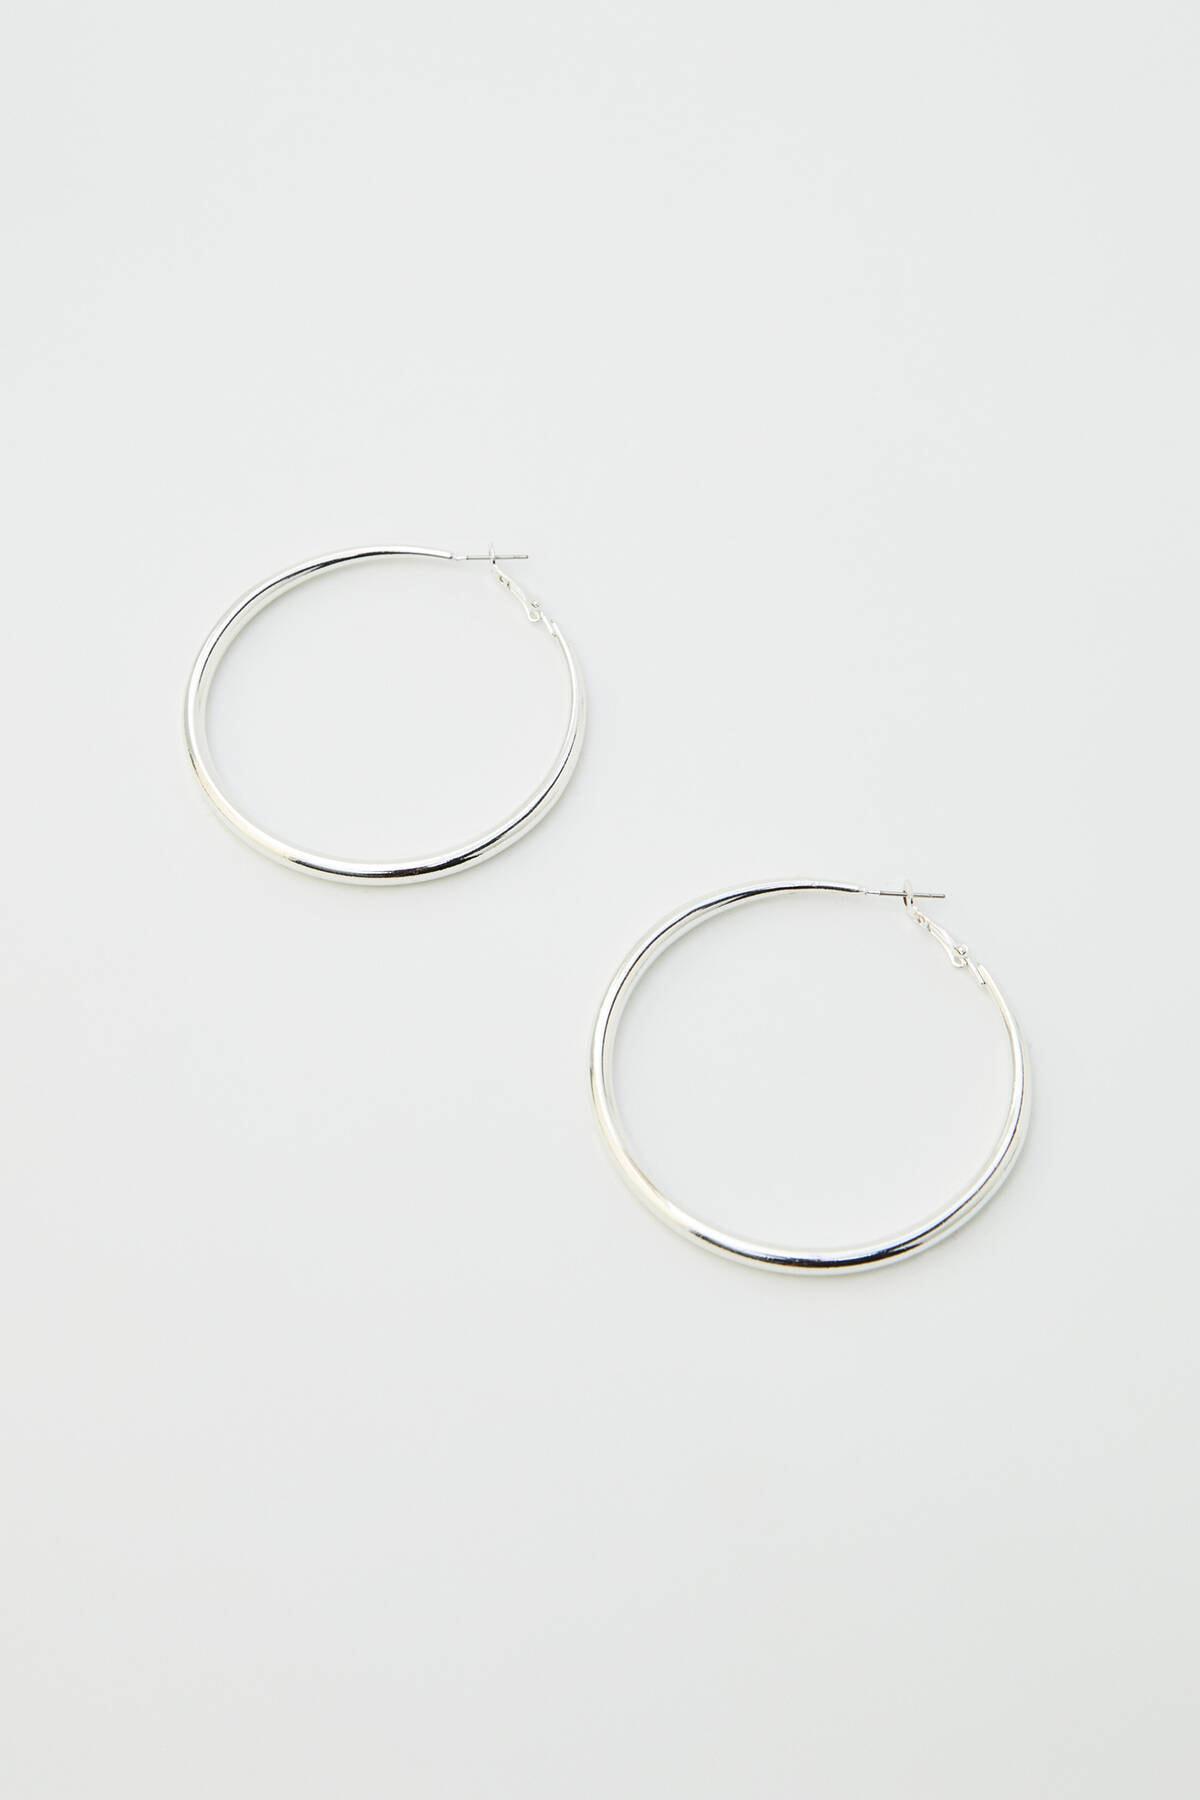 Pull & Bear Kadın Gümüş Karma Renkli Halka Küpe Seti 09996384 1